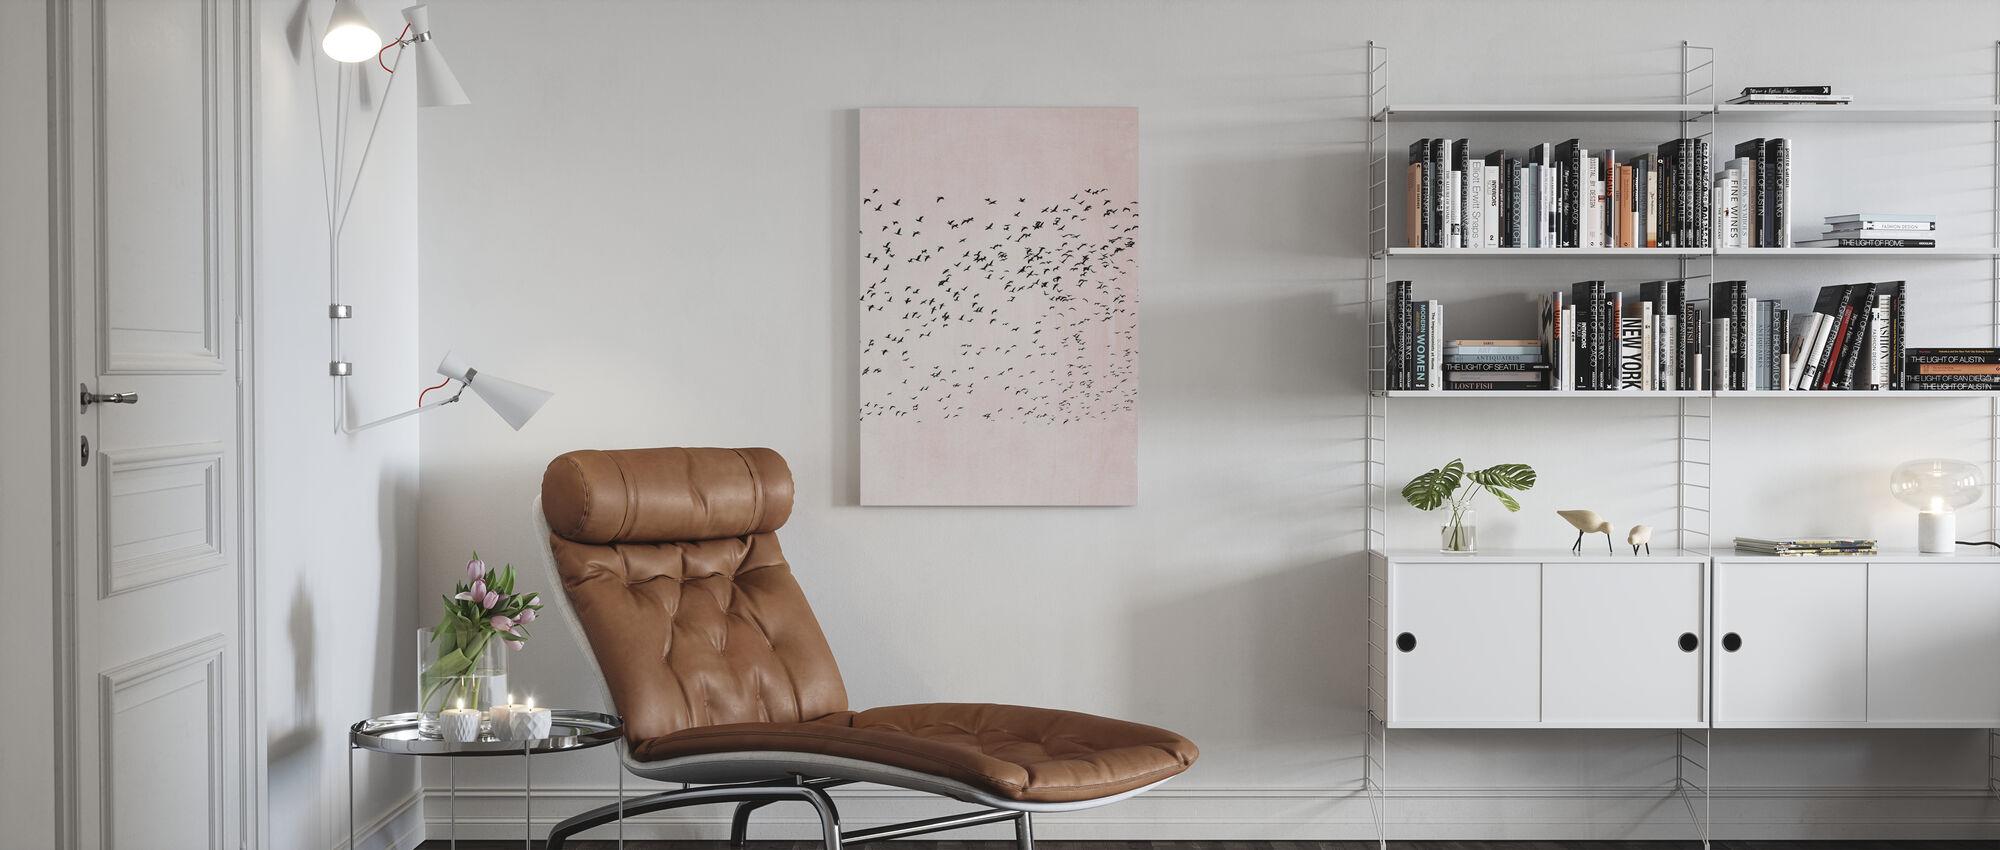 Verhuizen - Canvas print - Woonkamer